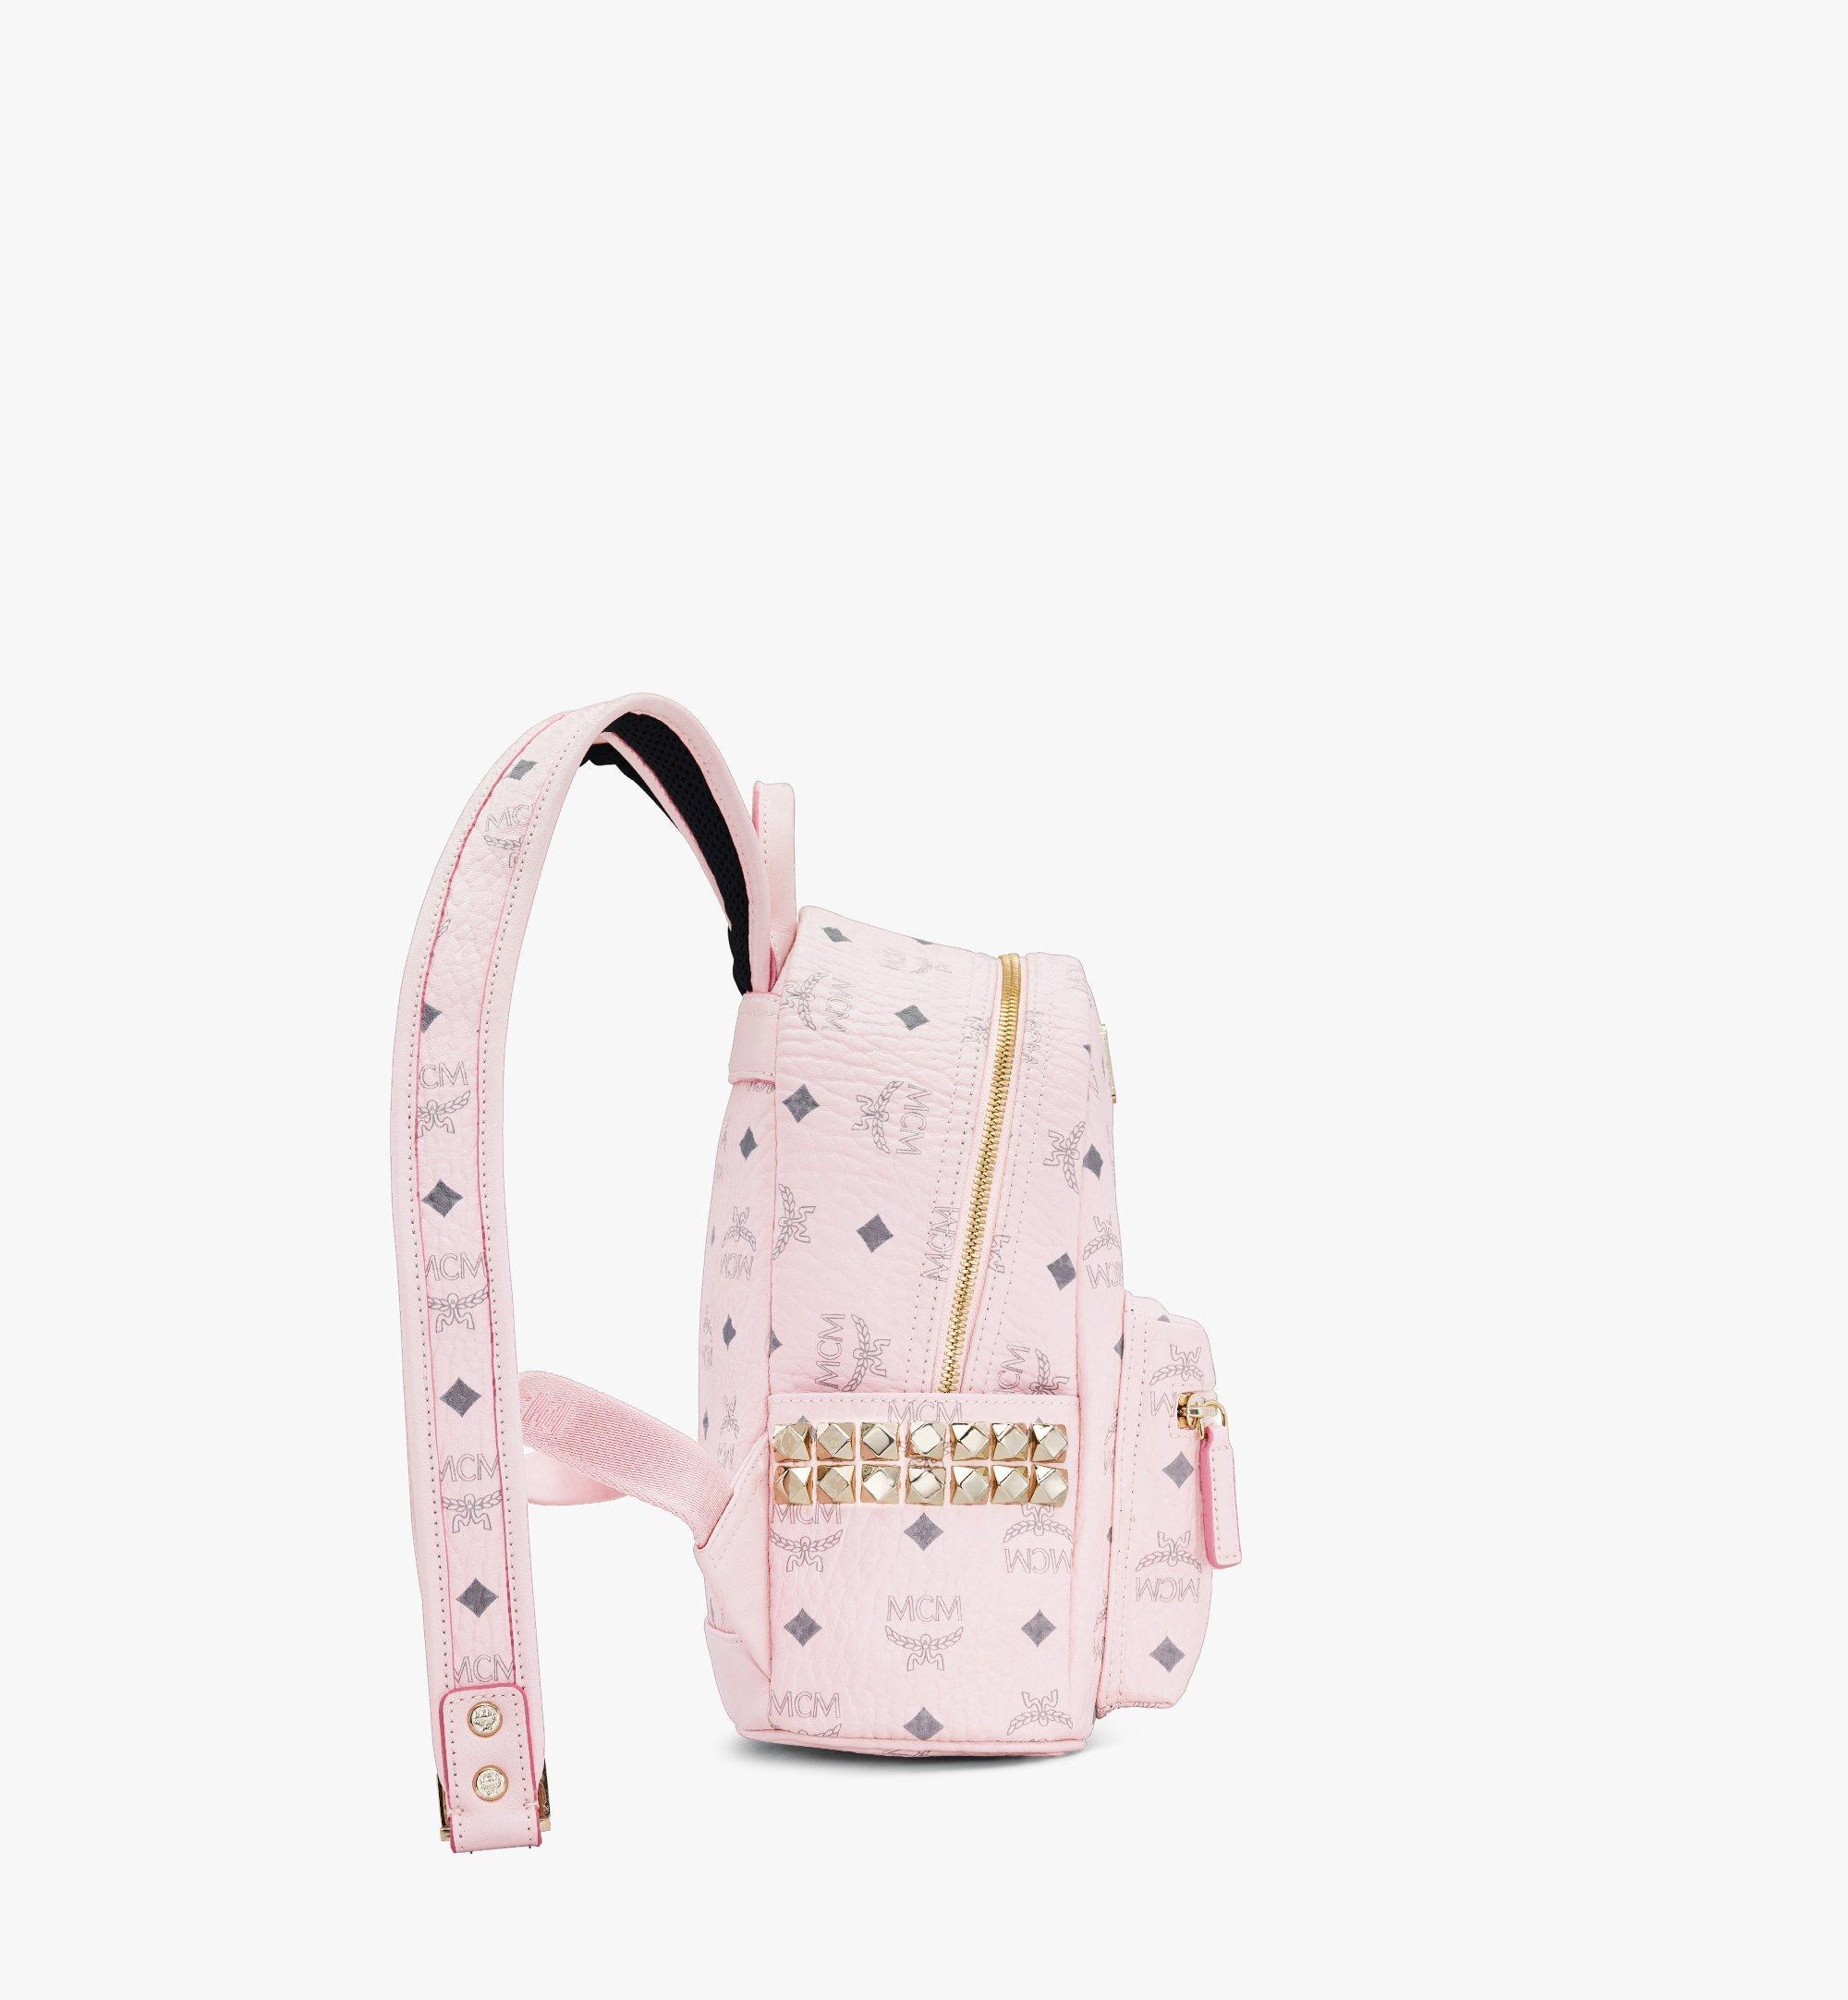 27 cm 10.5 in Stark Backpack in Visetos Powder Pink | MCM® DE